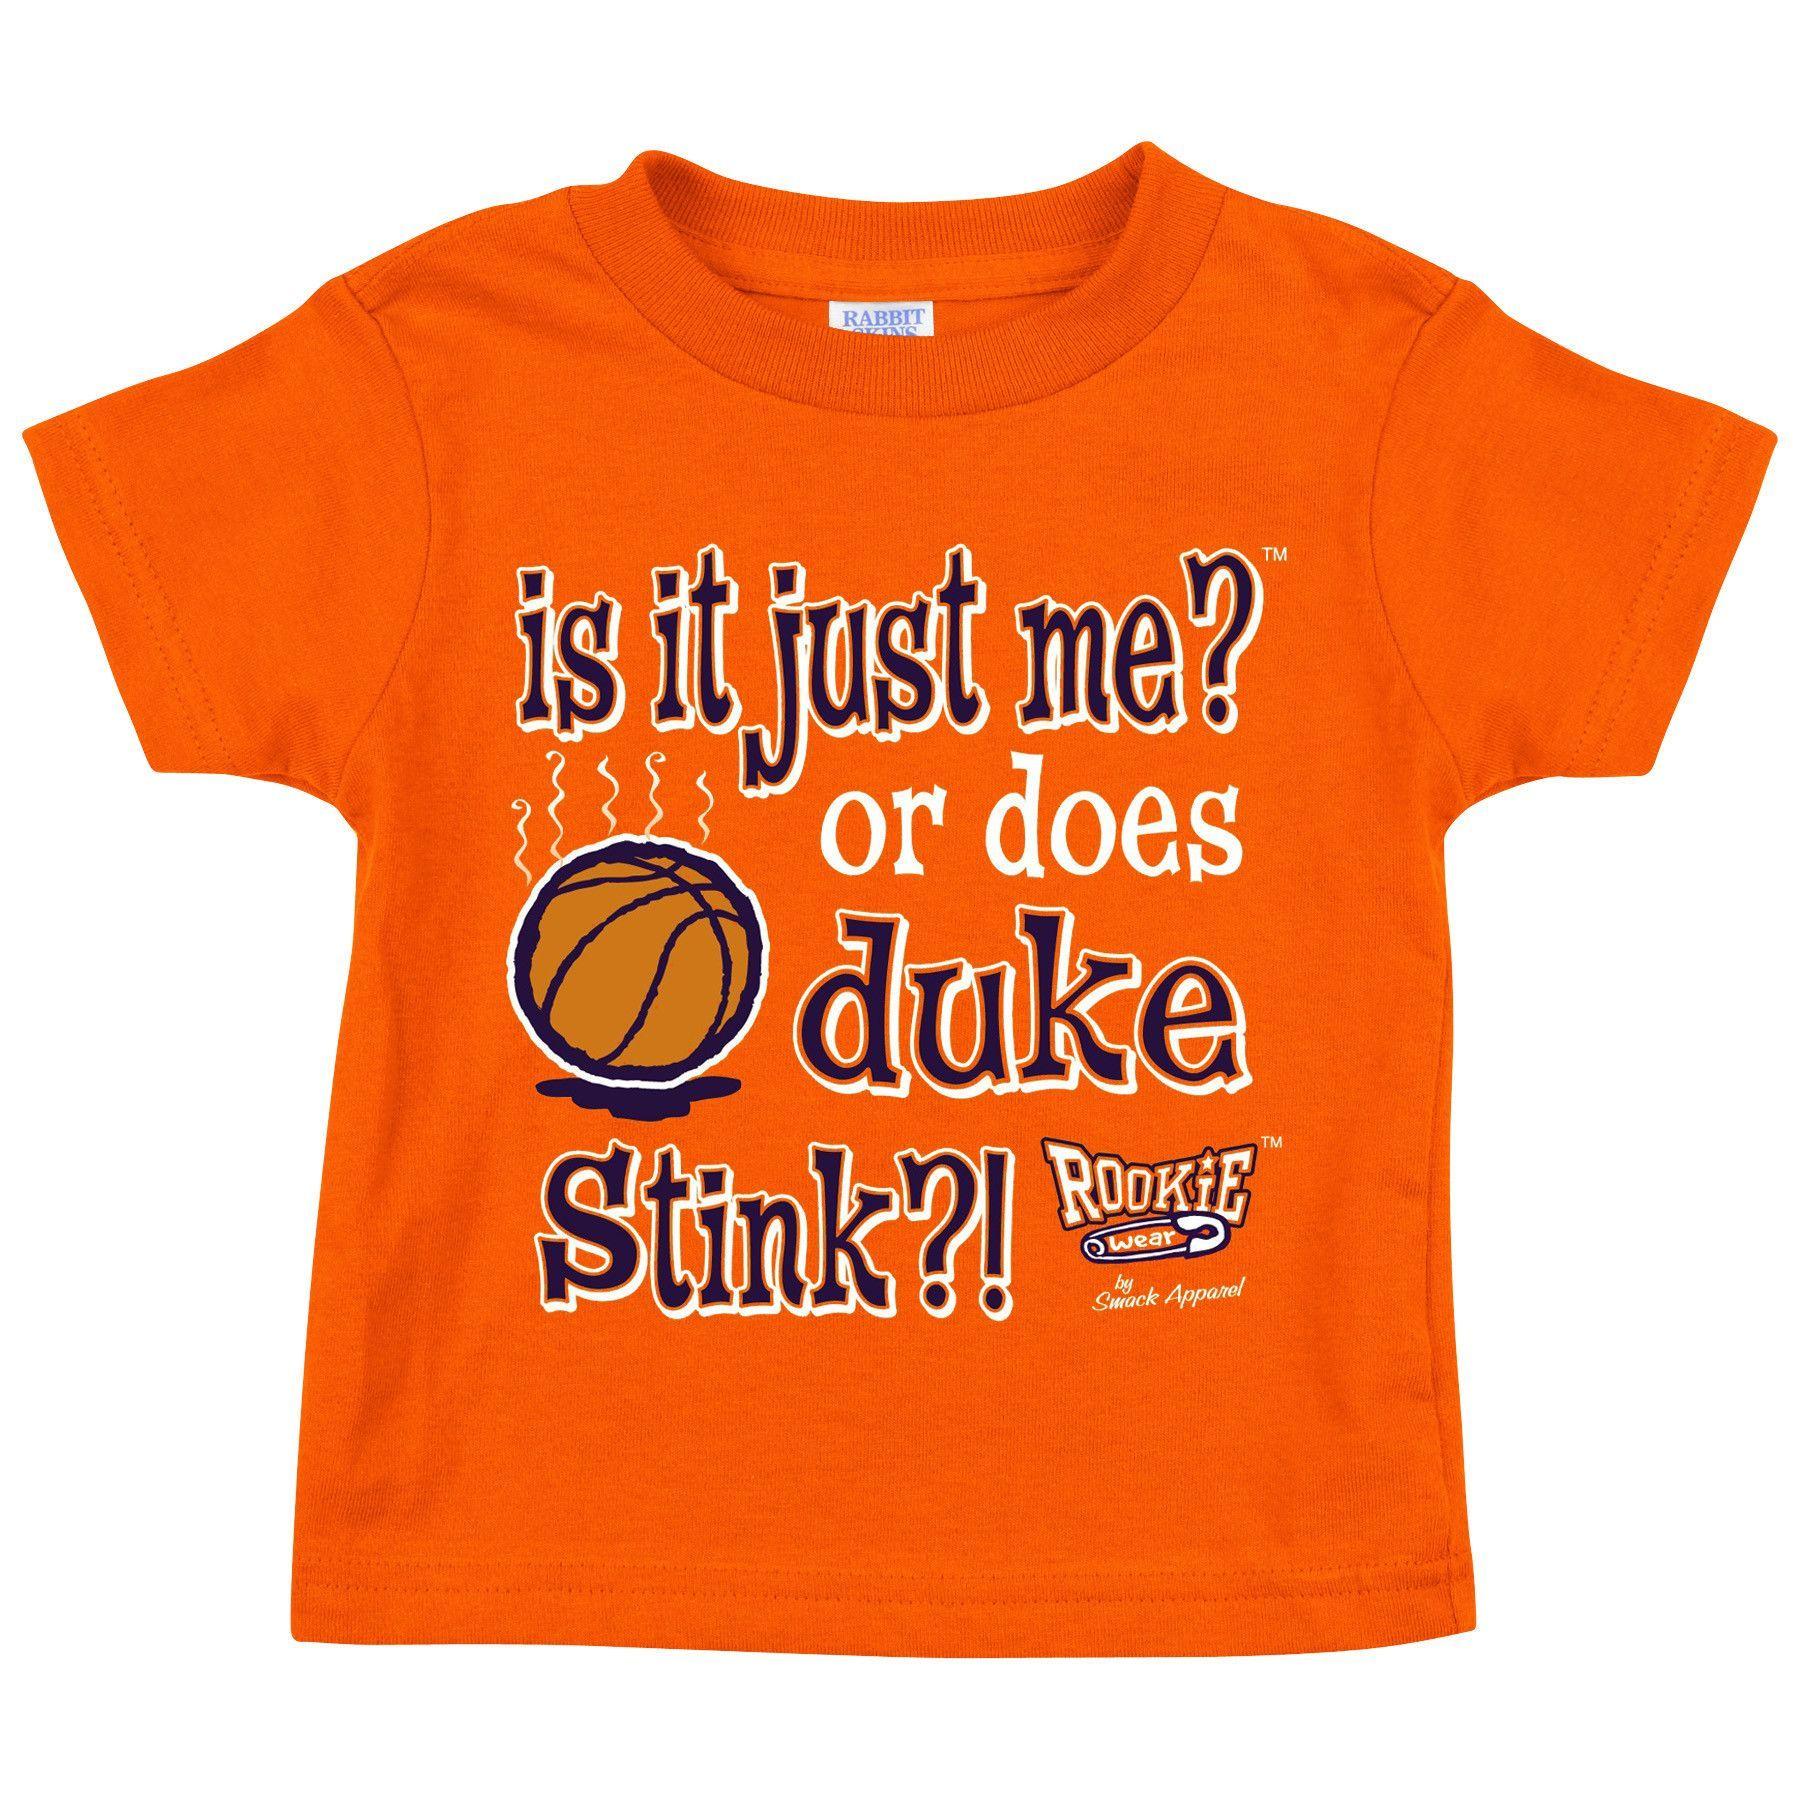 Syracuse Orange Fans Is It Just Me Anti Duke Toddler Tee 2T 4T